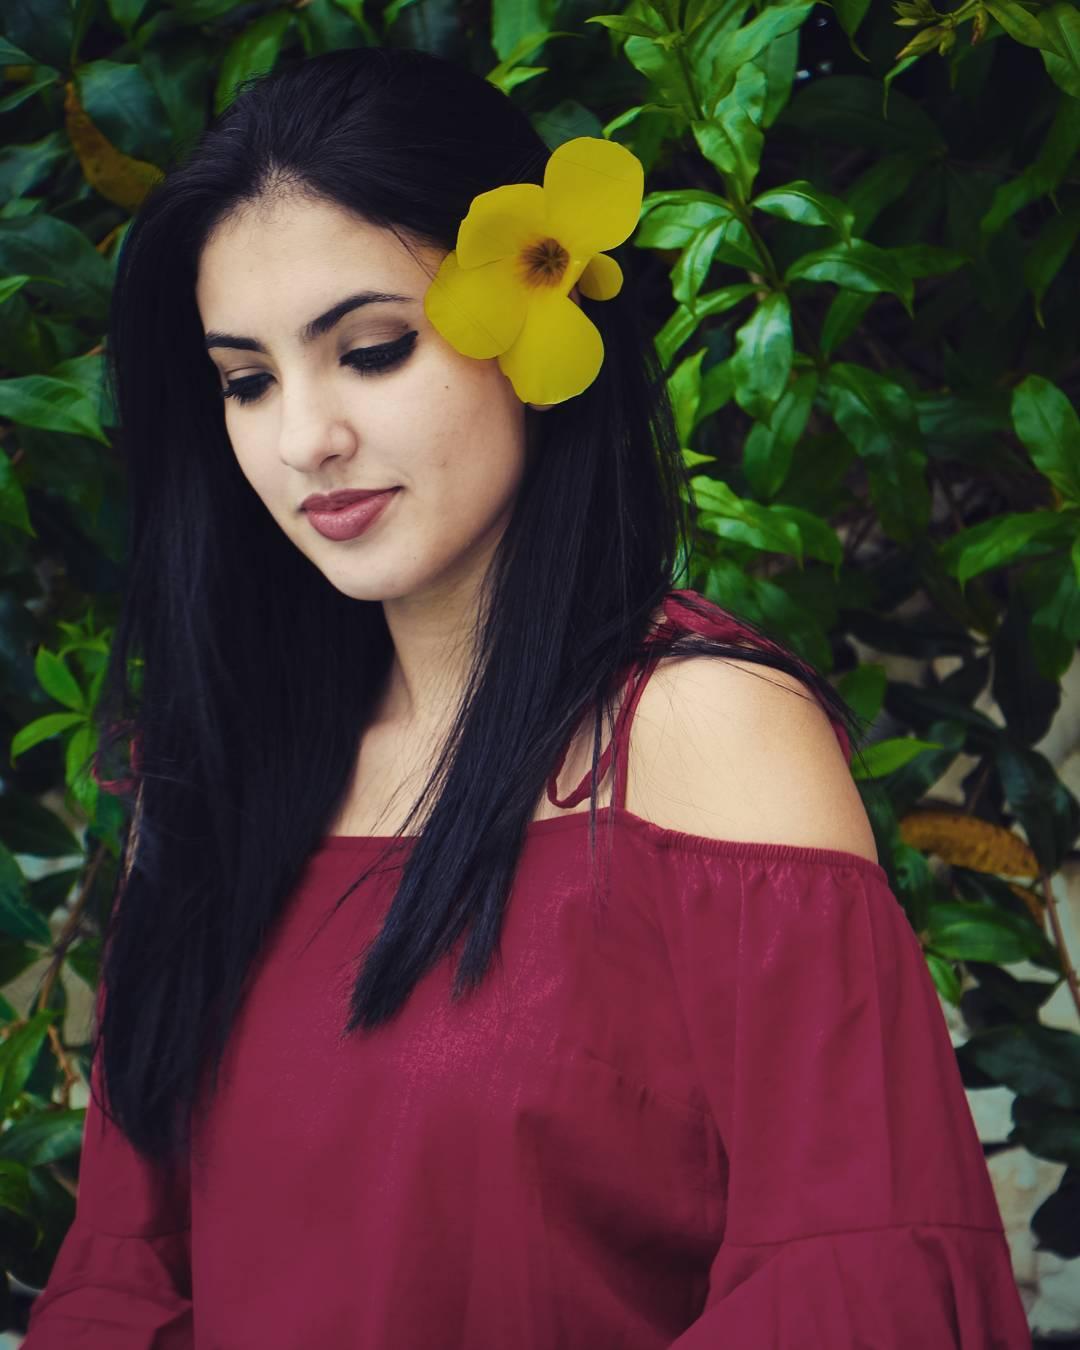 cristielli camargo, miss supranational vale do rio grande 2020/top 21 de miss brasil mundo 2018. - Página 2 27580511